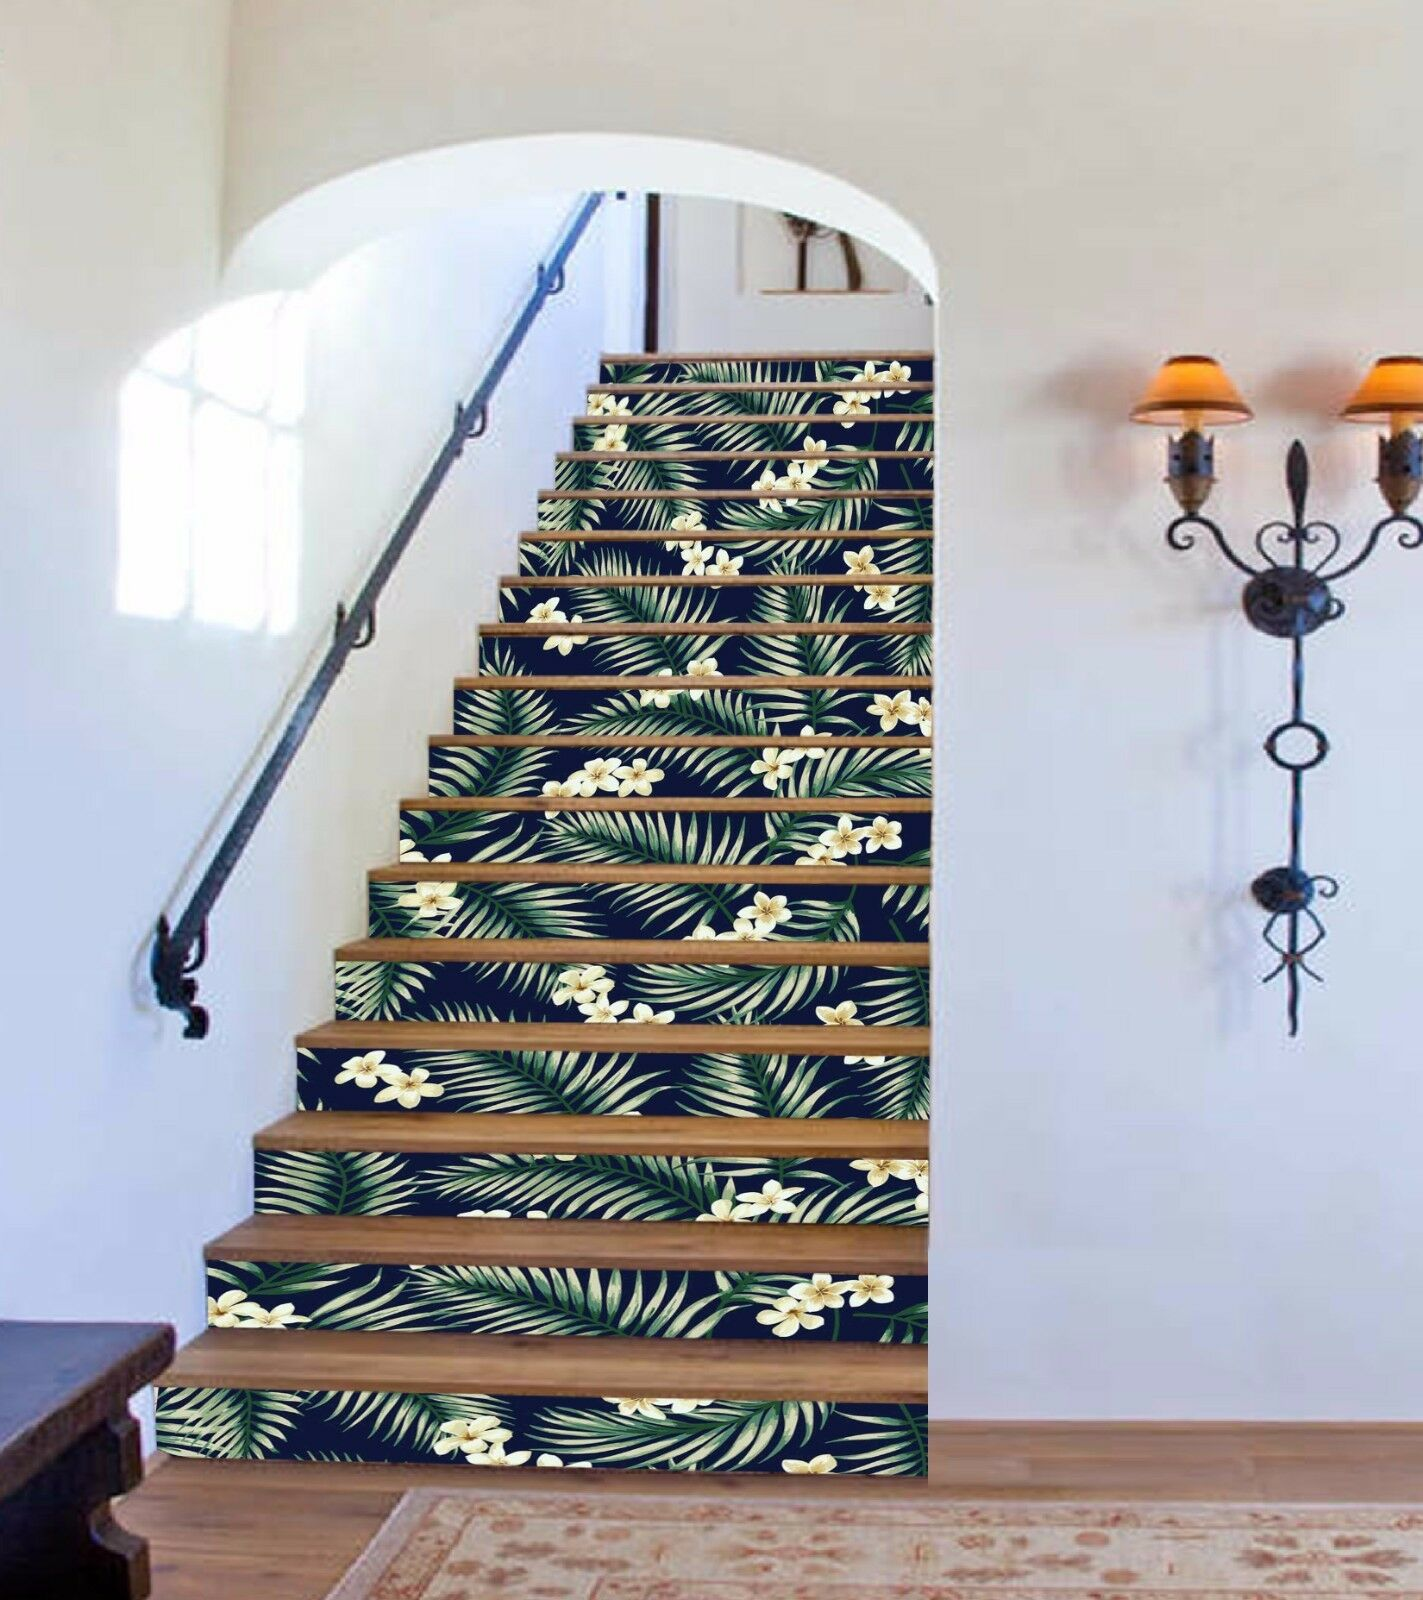 3D Flower Leaf 775 Stair Risers Decoration Photo Mural Vinyl Decal Wallpaper AU